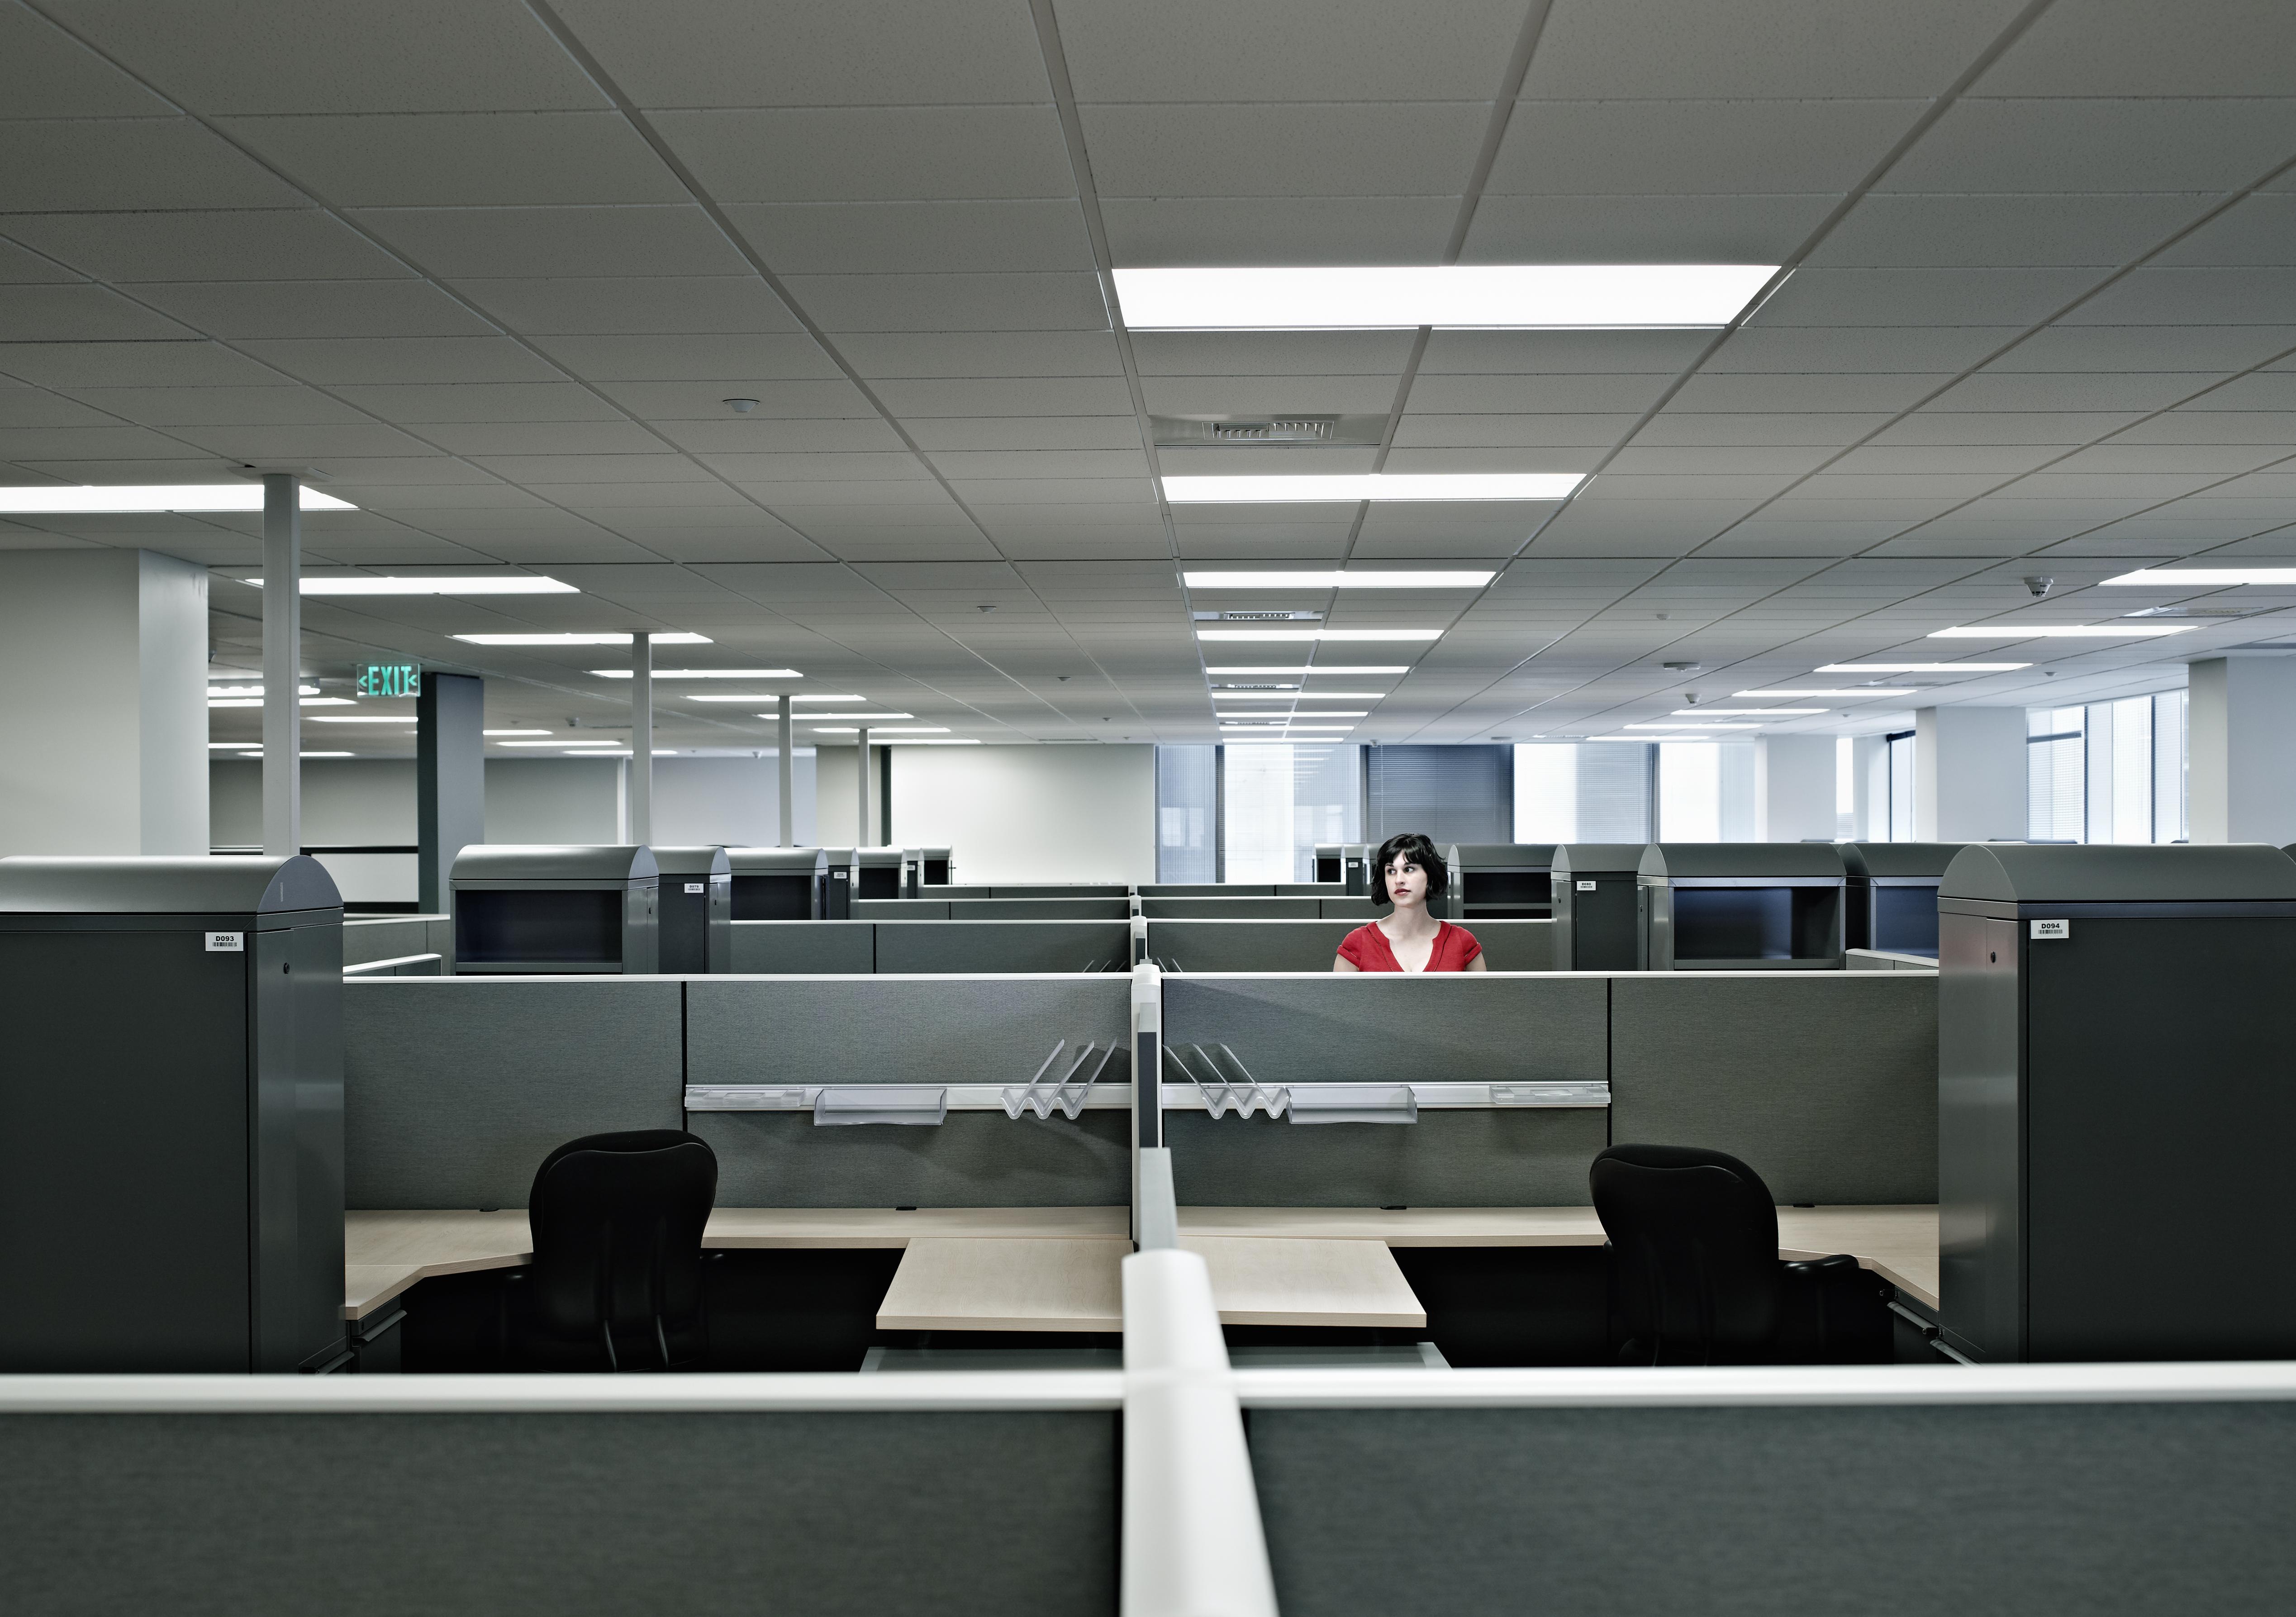 Businesswoman standing alone in empty office